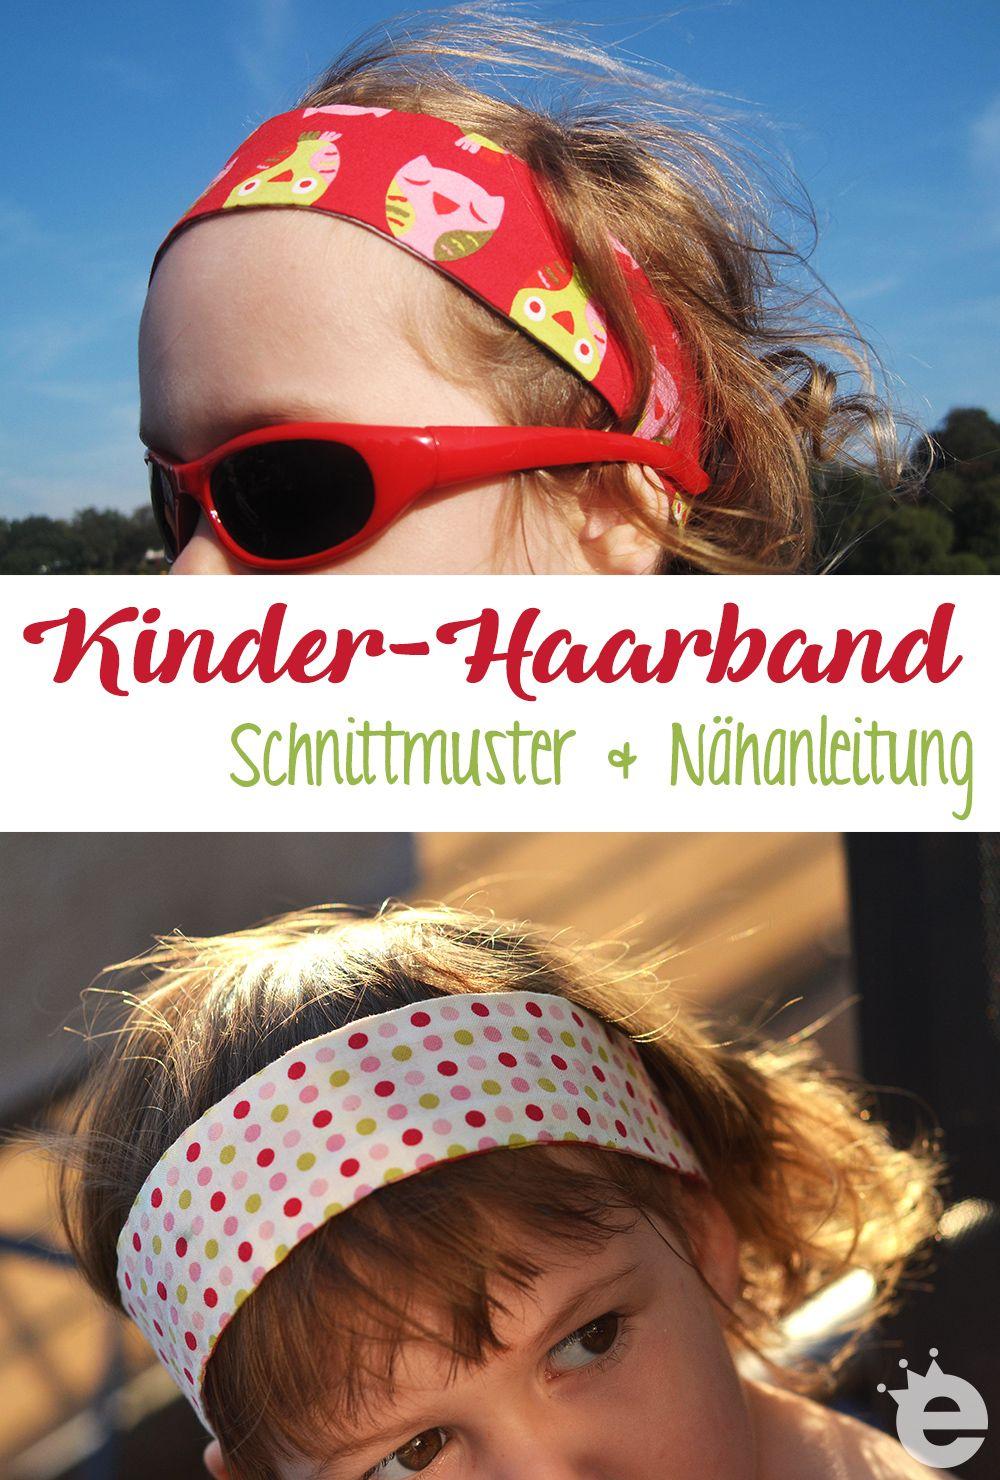 Haarband nähen: Schnittmuster und Tutorial | Gratis schnittmuster ...